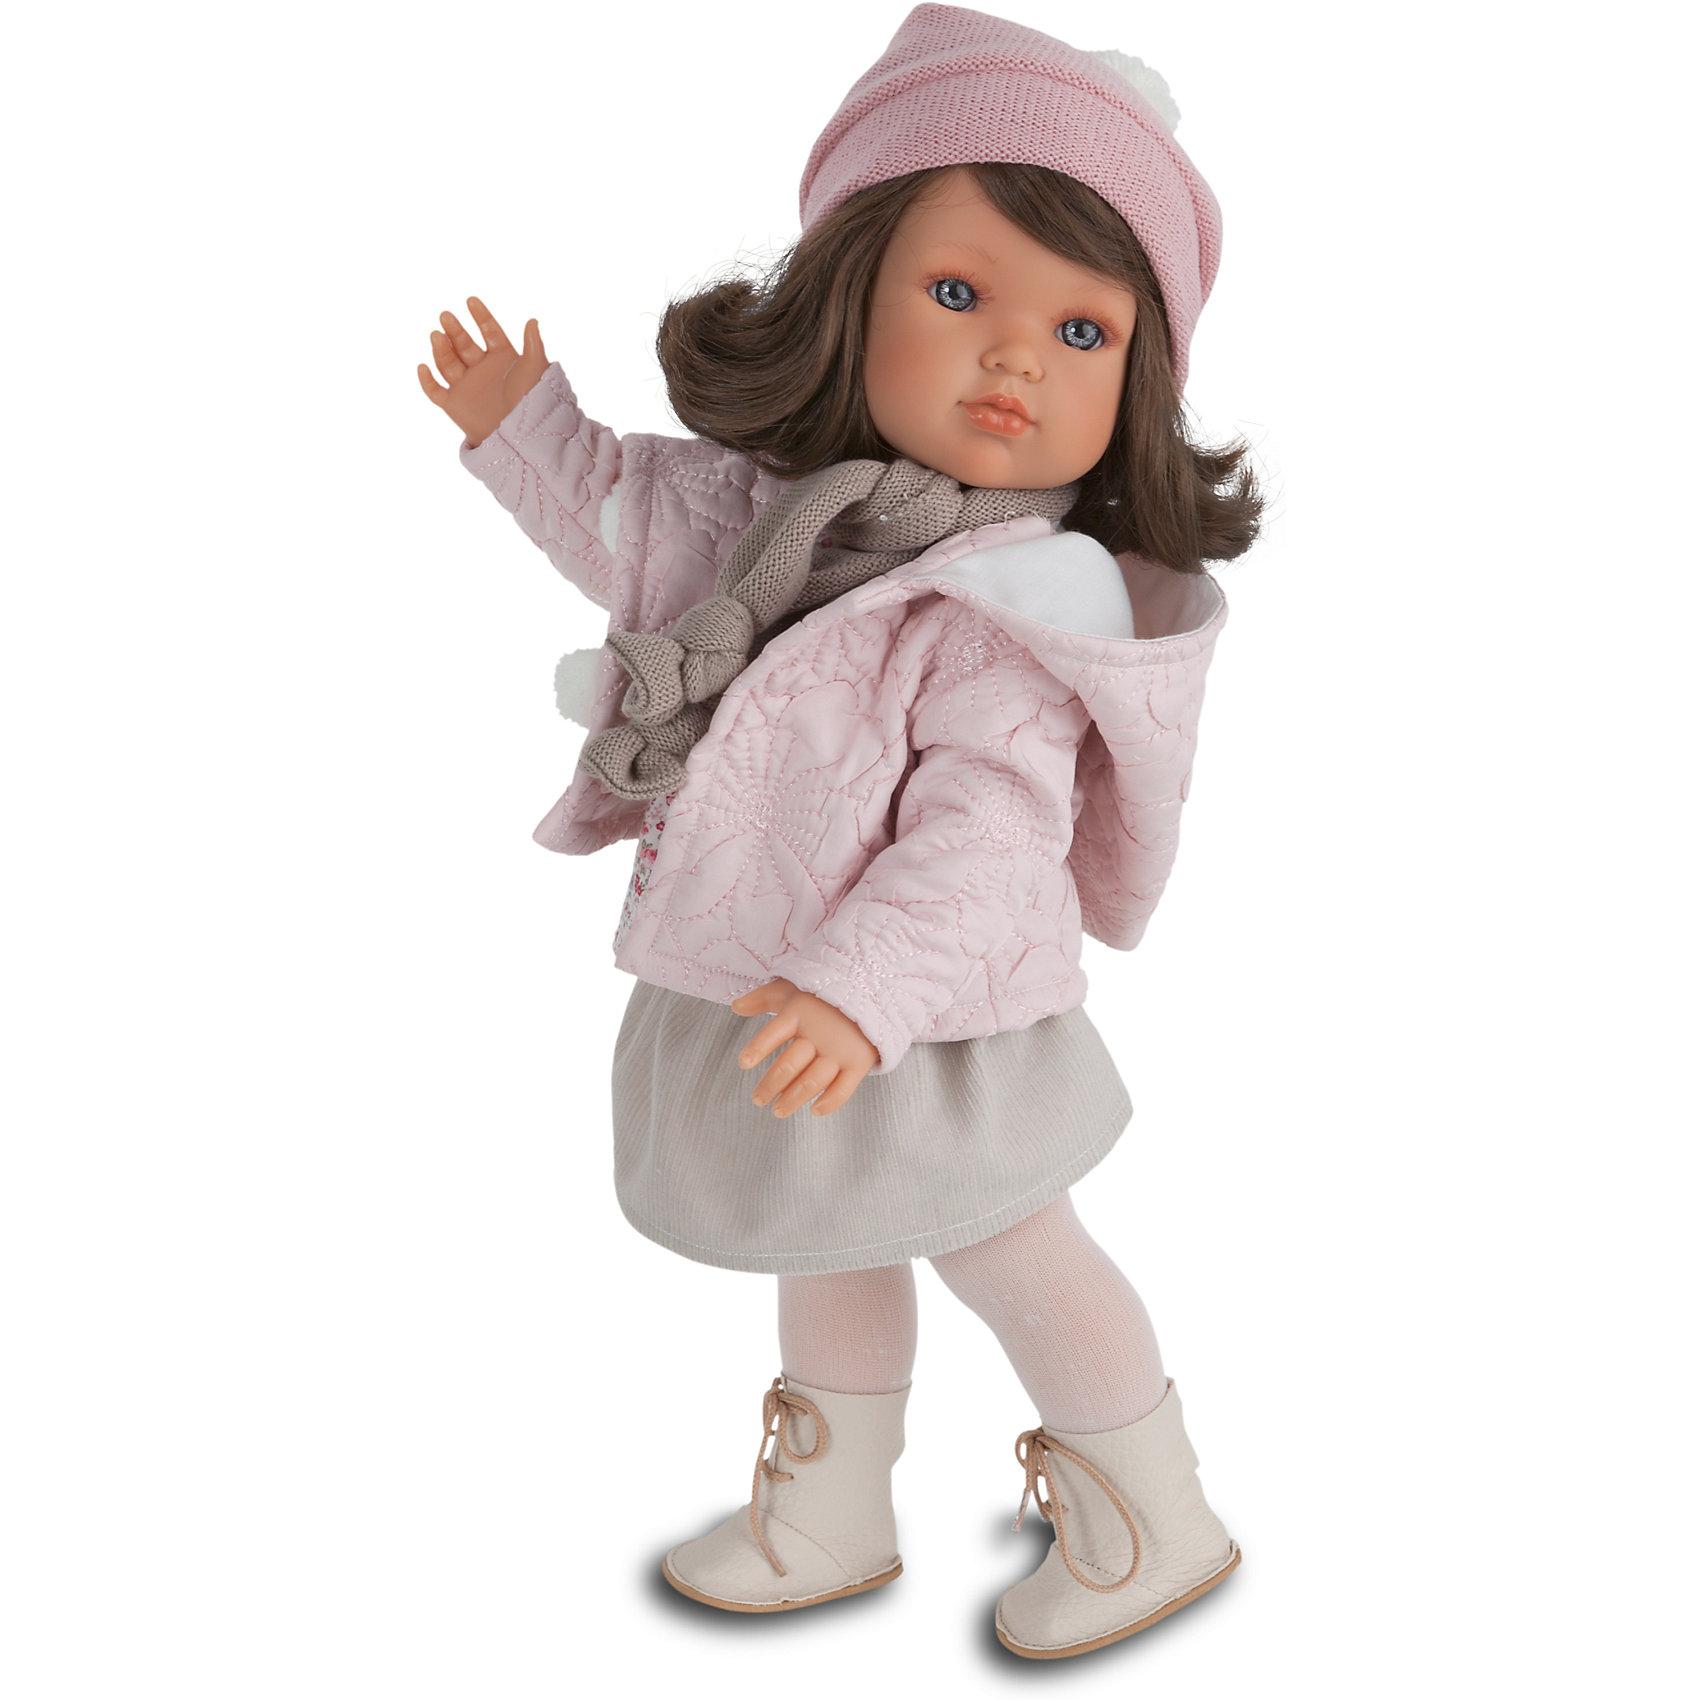 Munecas Antonio Juan Кукла Белла Зимний наряд, 45 см, Munecas Antonio Juan куклы gulliver кукла дынька 30см